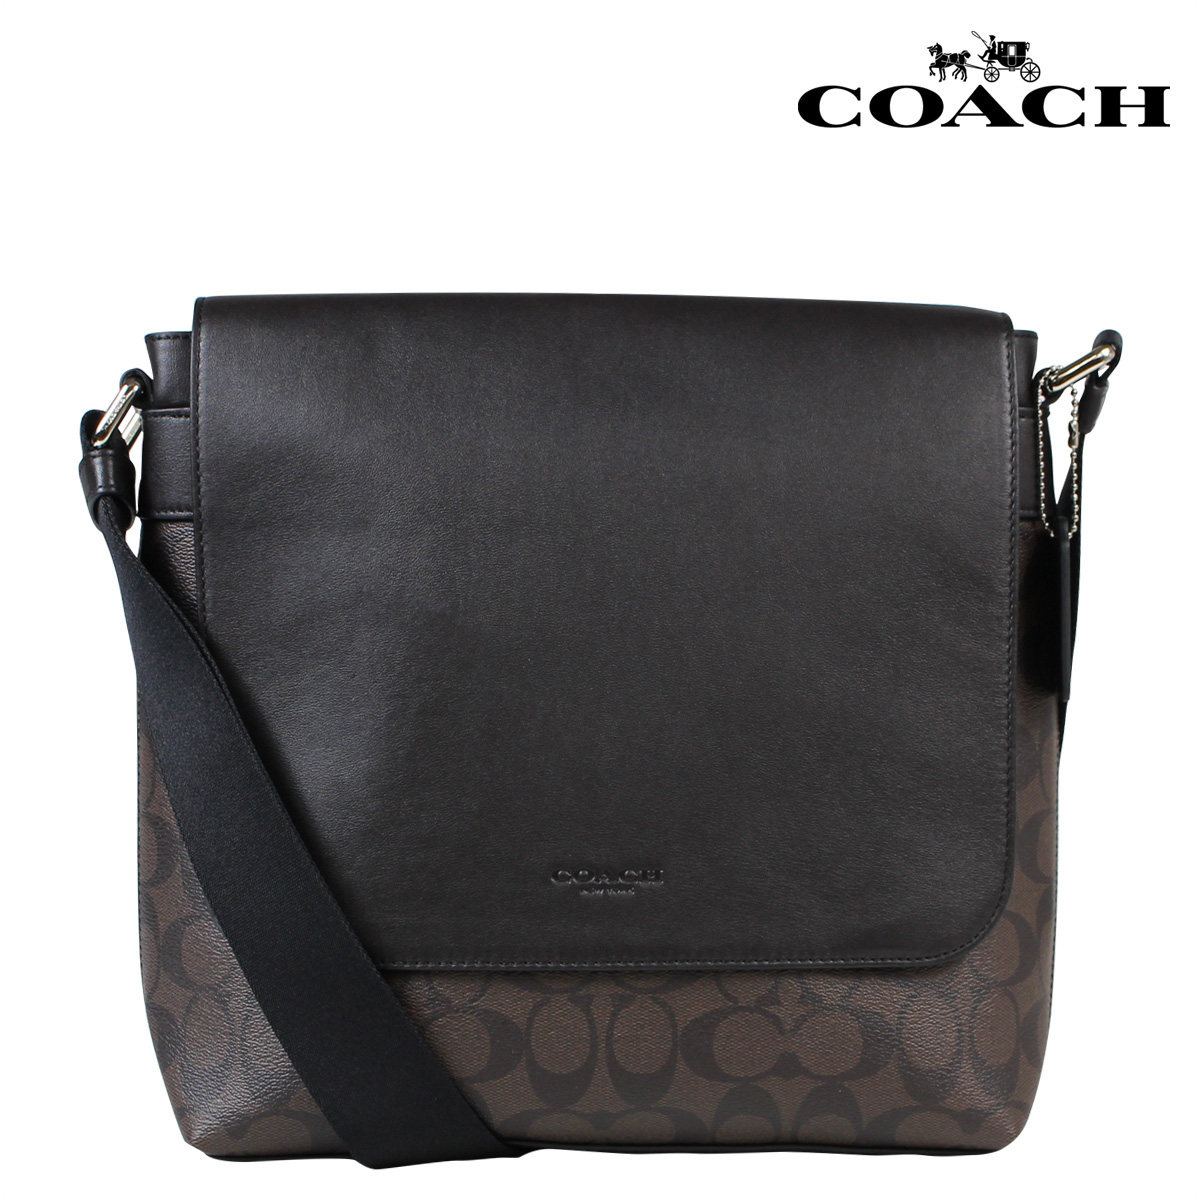 9799bec228 SneaK Online Shop: Coach COACH bag shoulder bag men messenger bag ...